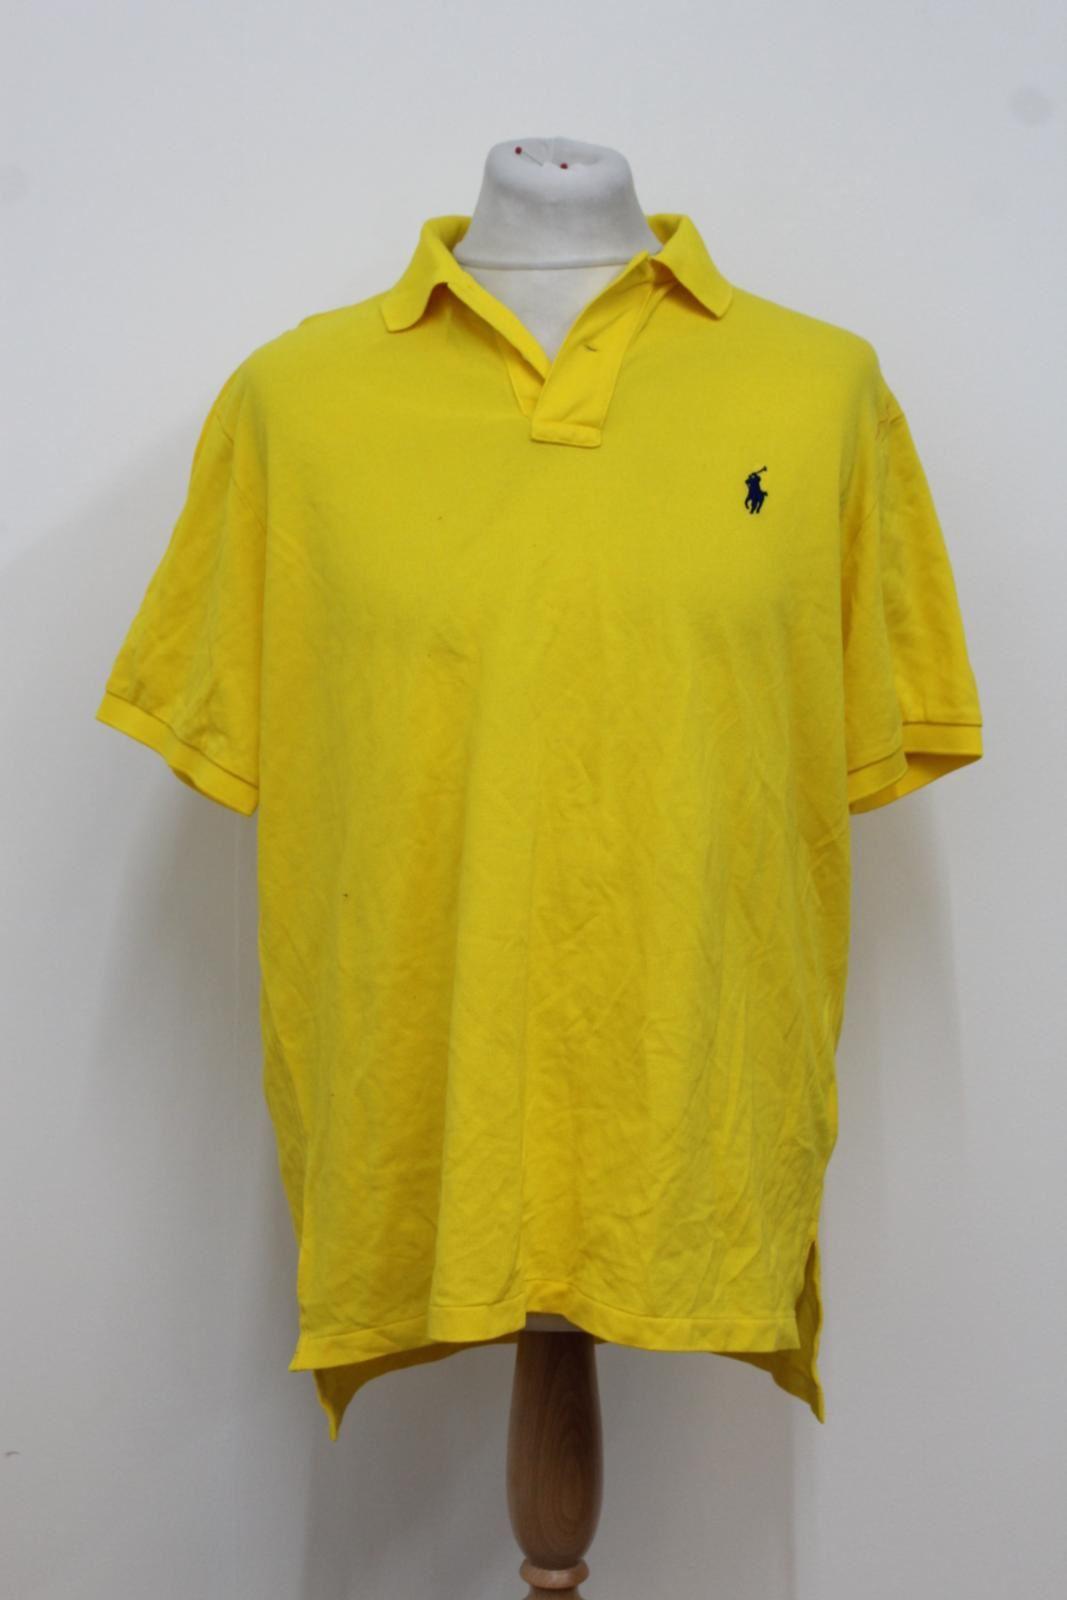 Ralph-Lauren-Polo-para-hombre-de-Amarillo-De-Algodon-Manga-Corta-Camisa-Polo-De-Ajuste-Personalizado